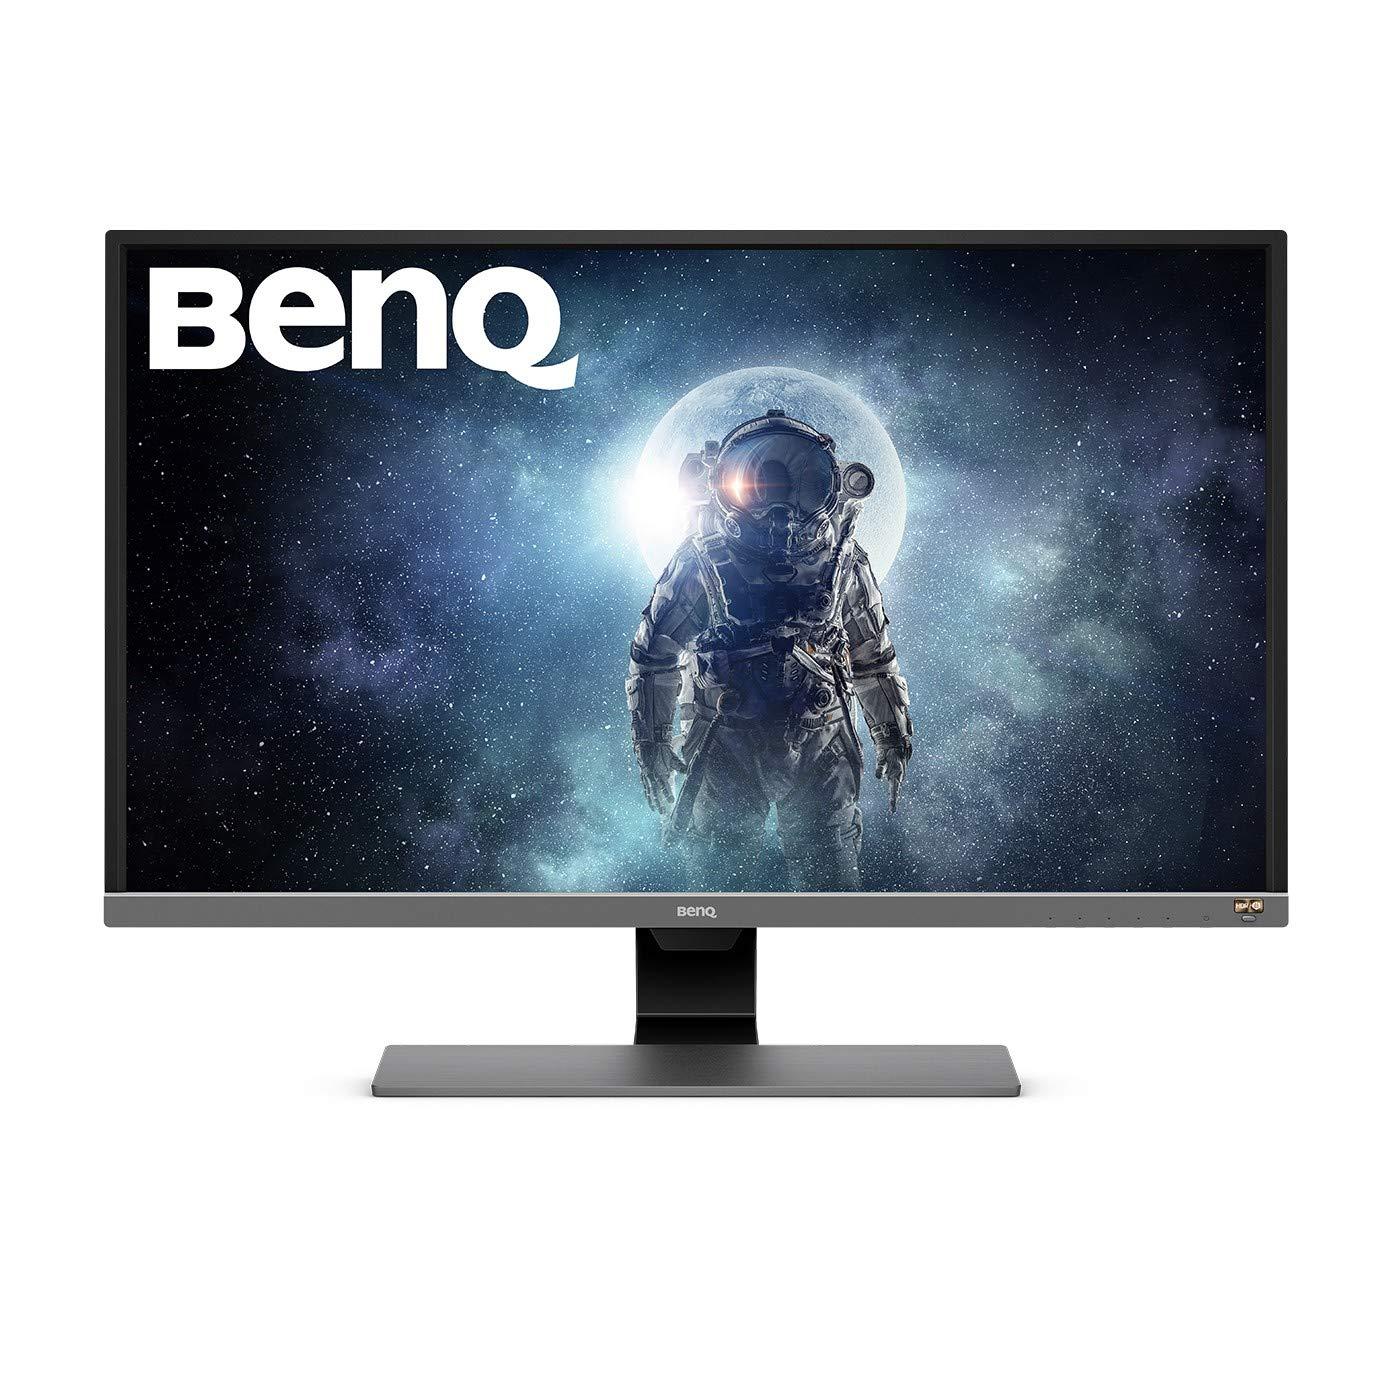 BenQ 31.5 Inch 4k HDR Monitor